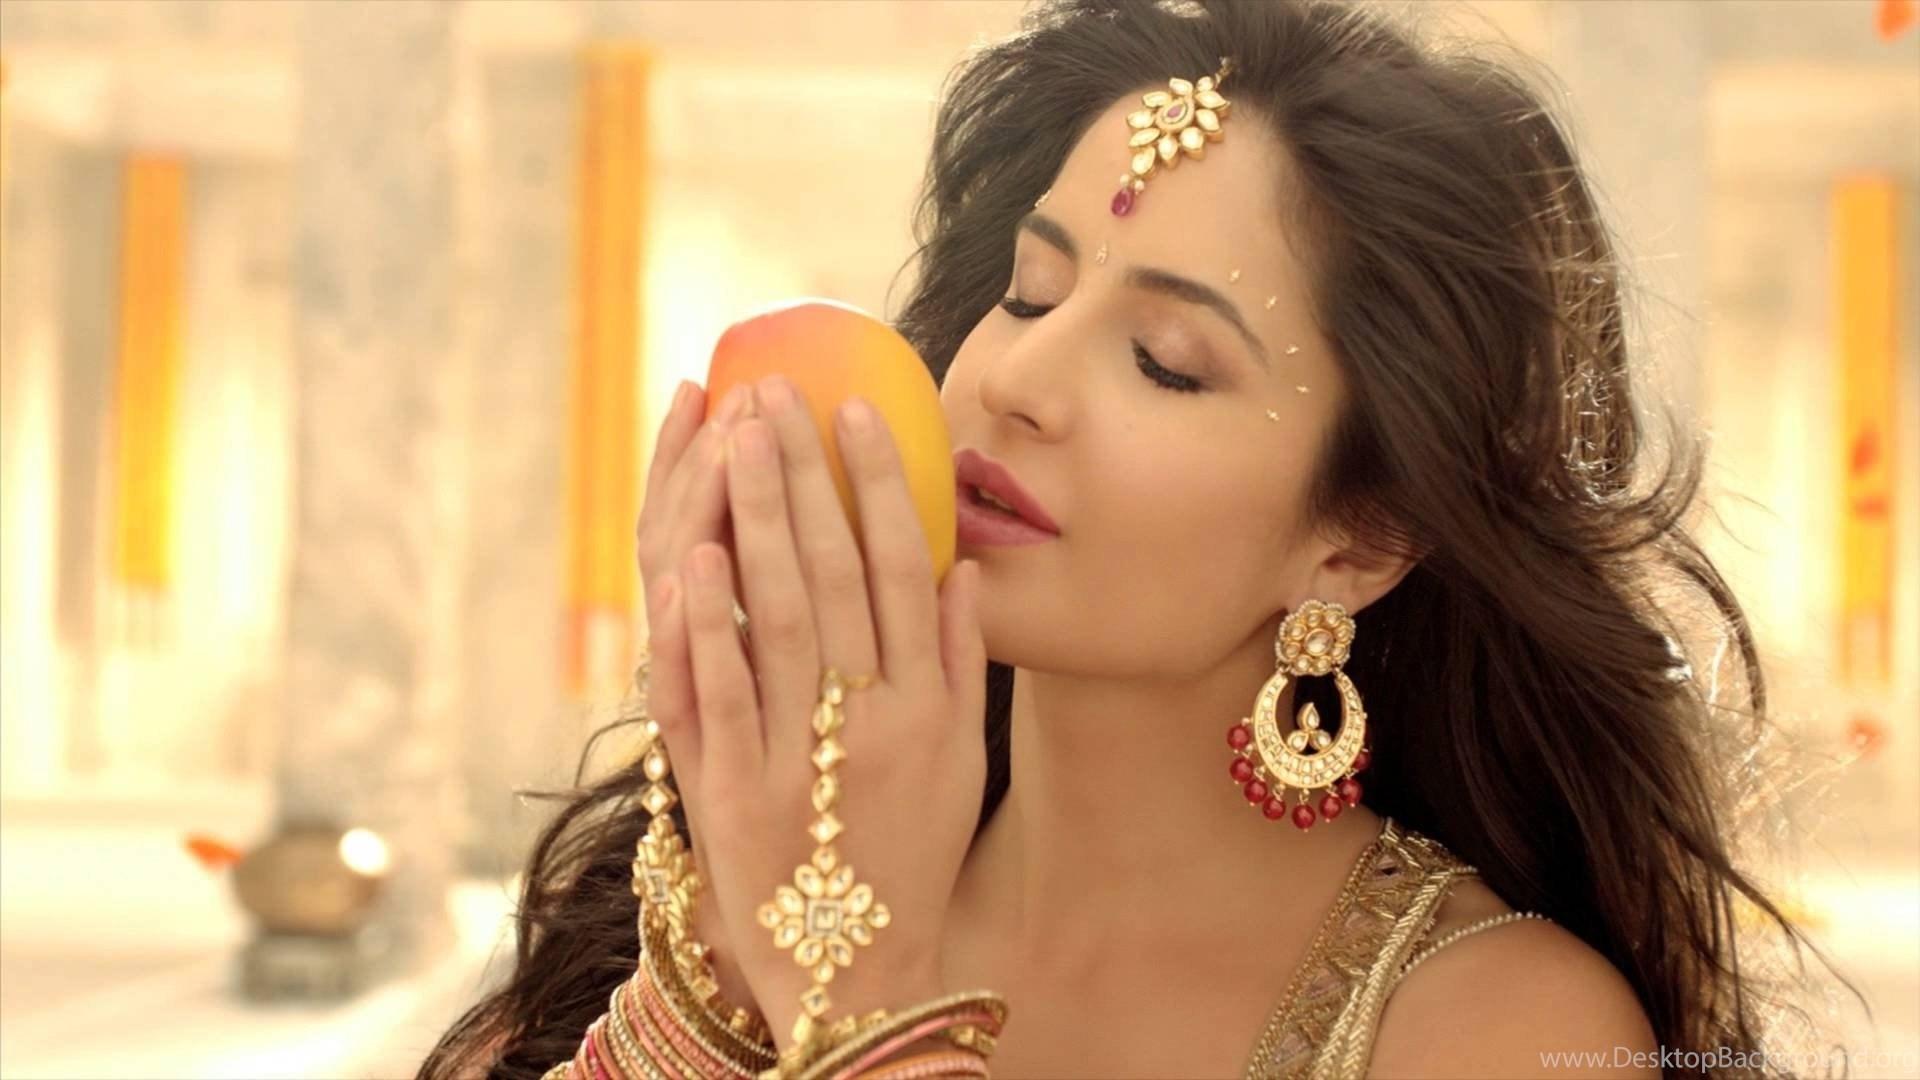 Katrina Kaif Most Popular Bollywood Actress Wallpapers In Slice